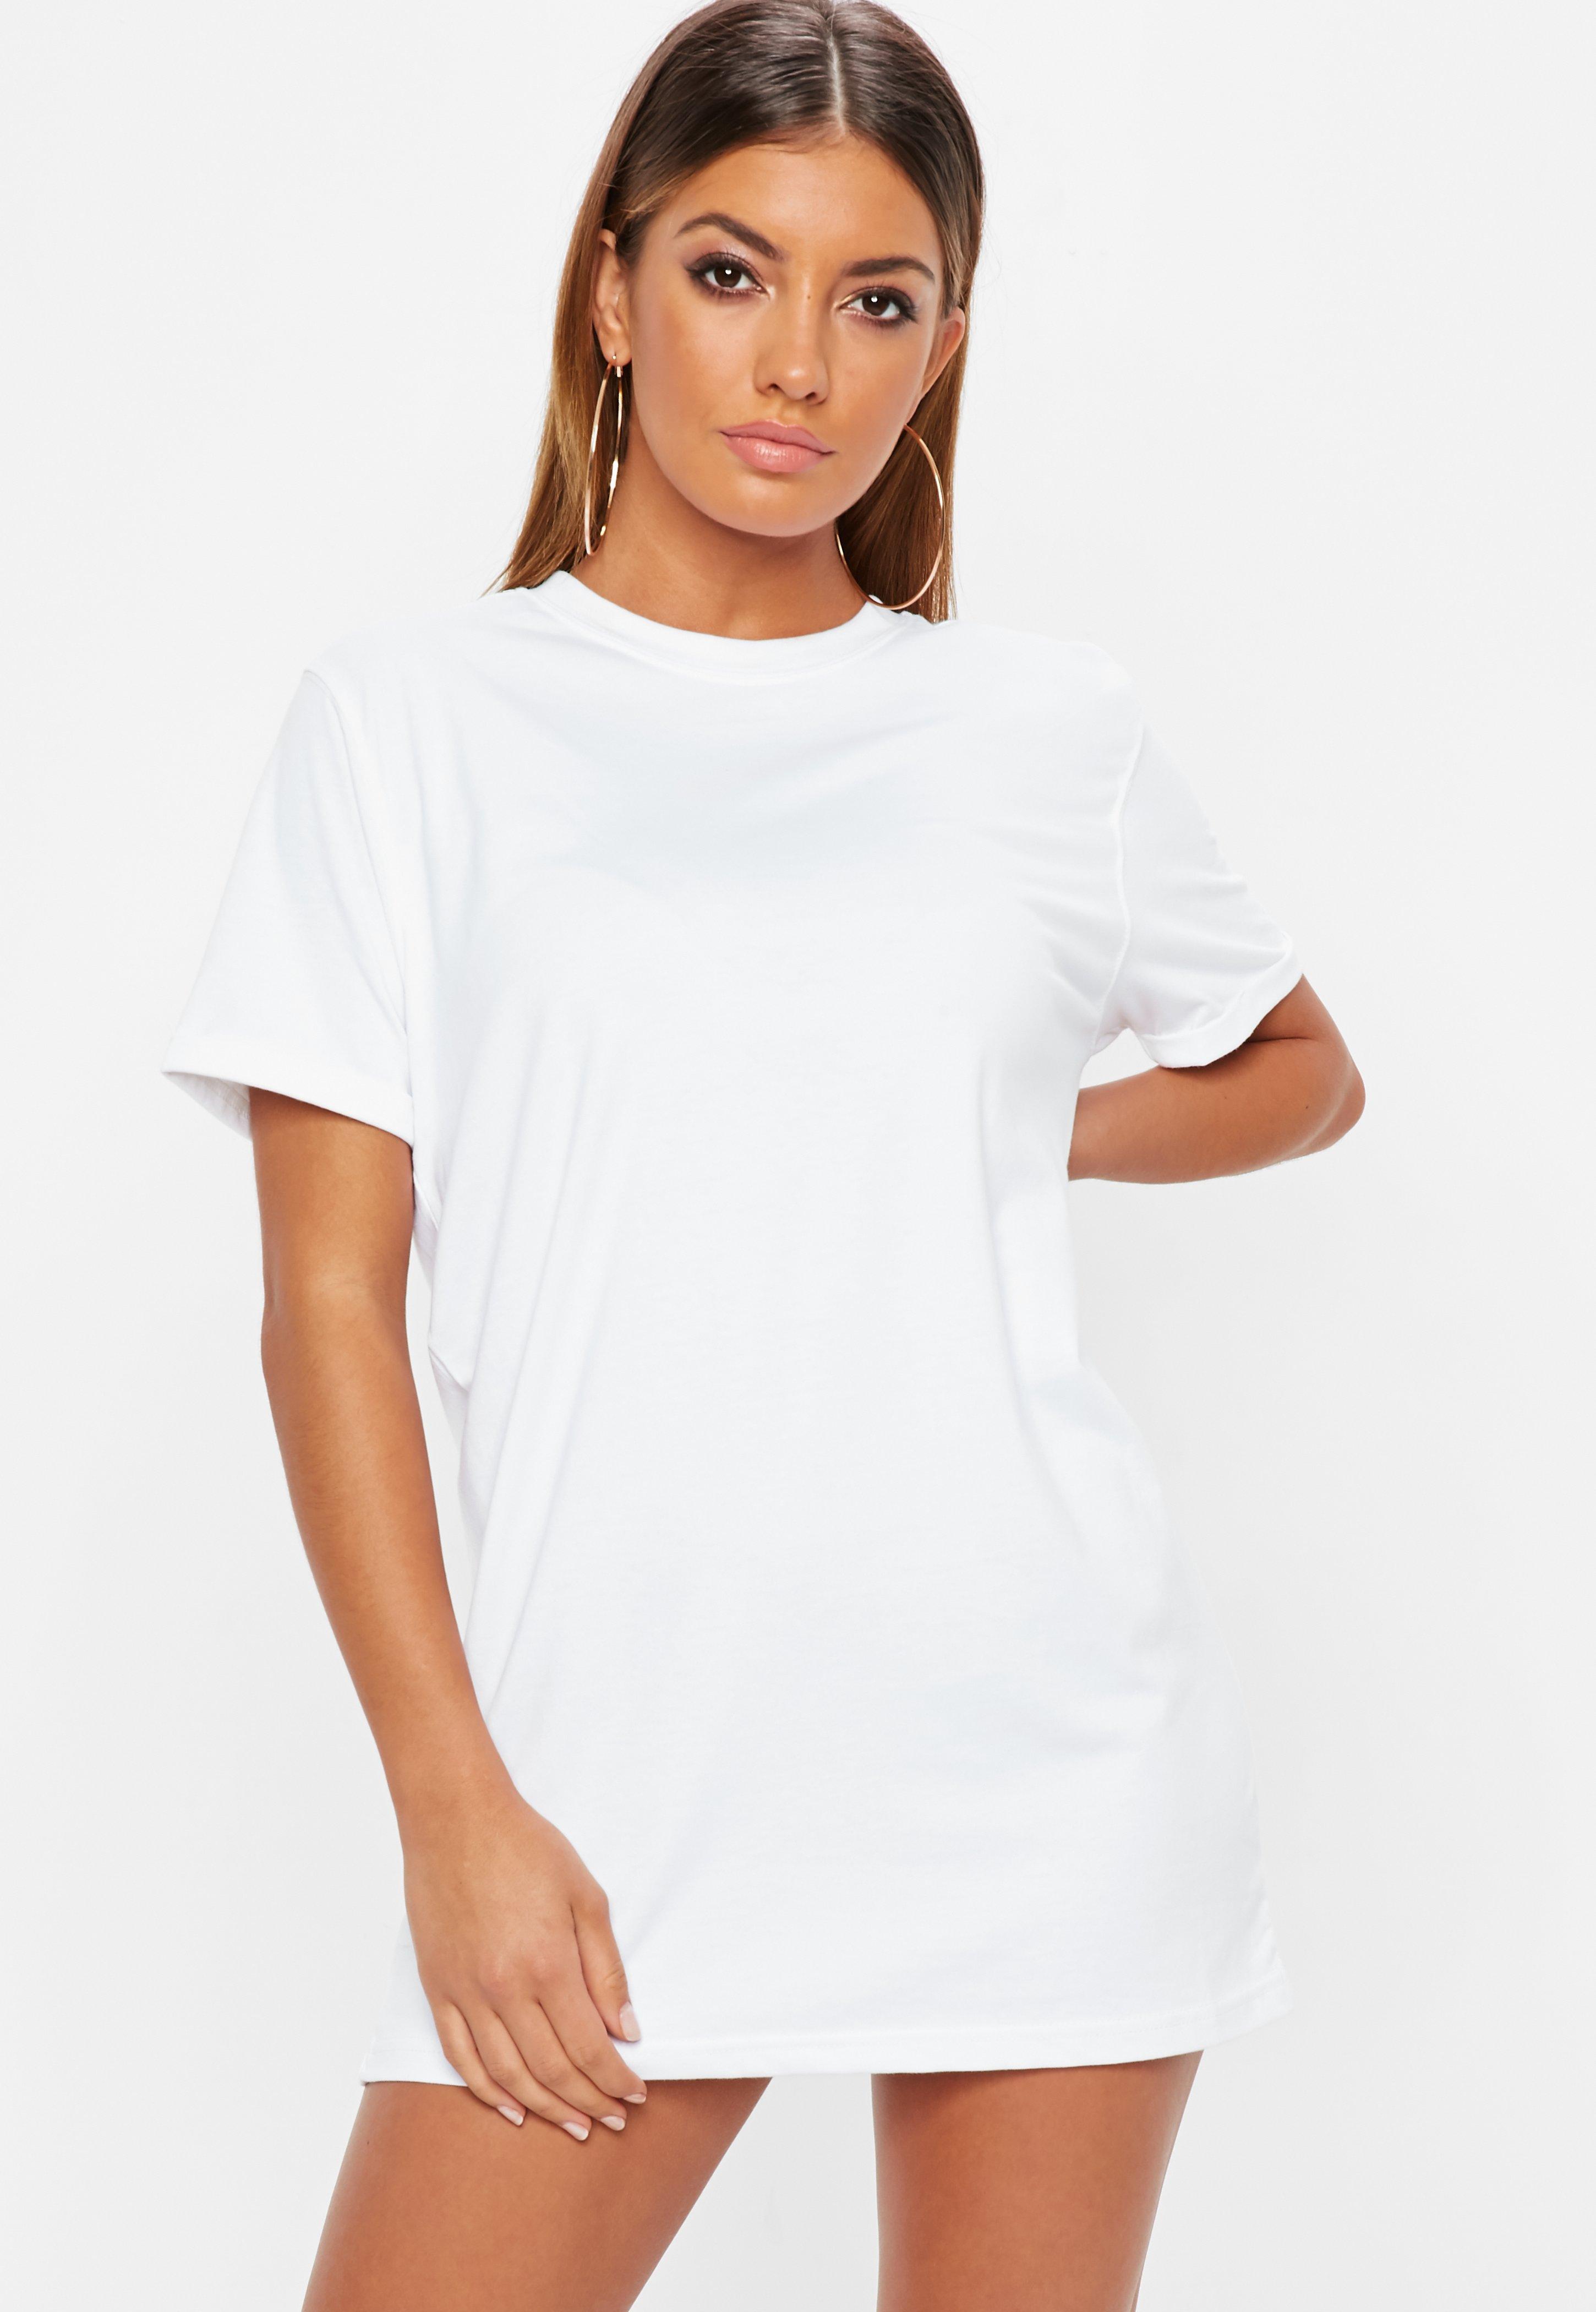 T-Shirt-Kleid – T-Shirt-Kleider online shoppen - Missguided DE 5f25ef81d3